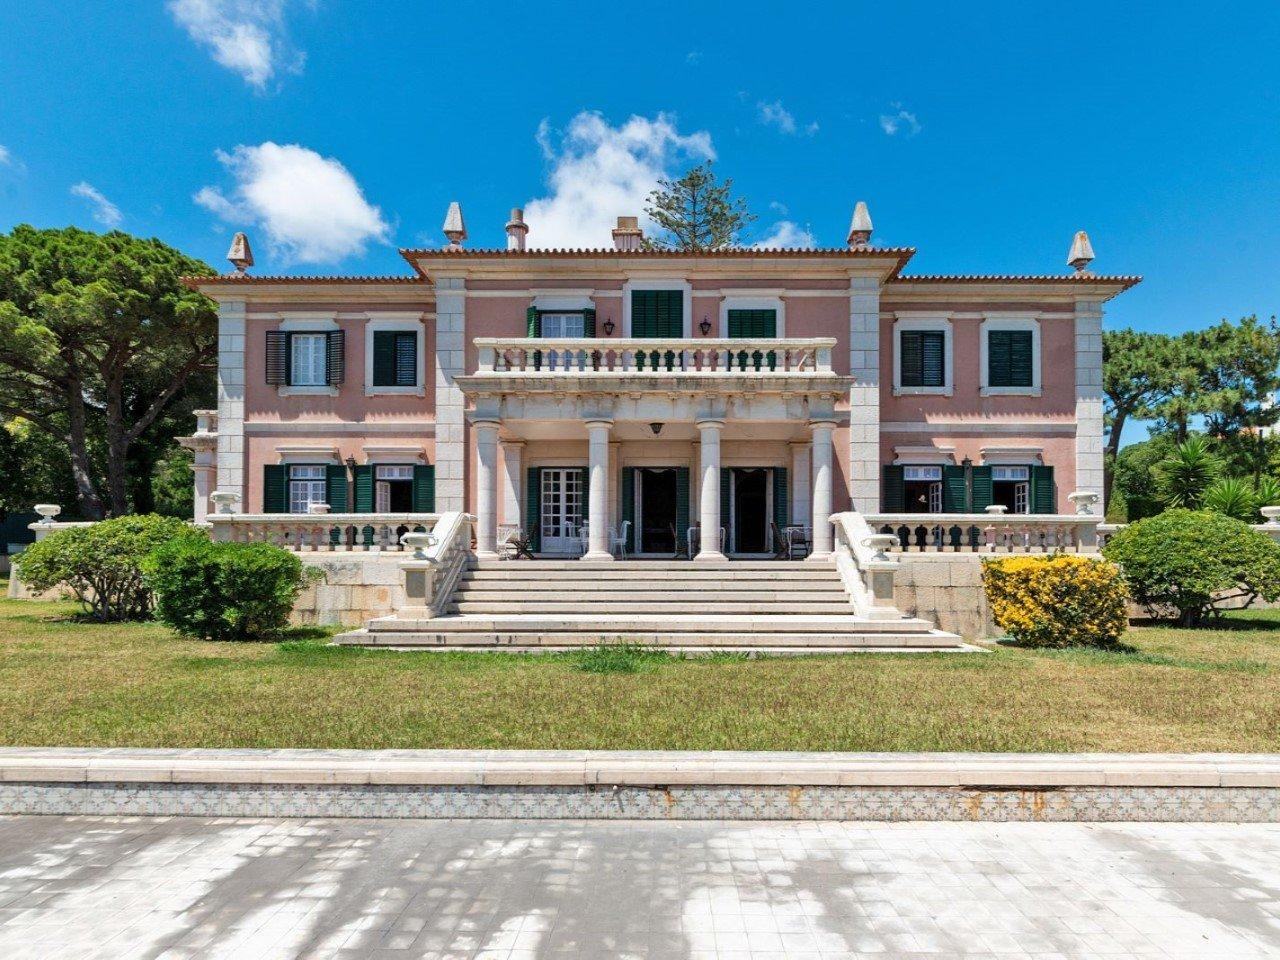 9 Bedroom Villa Cascais, Lisbon Ref: AMV13480